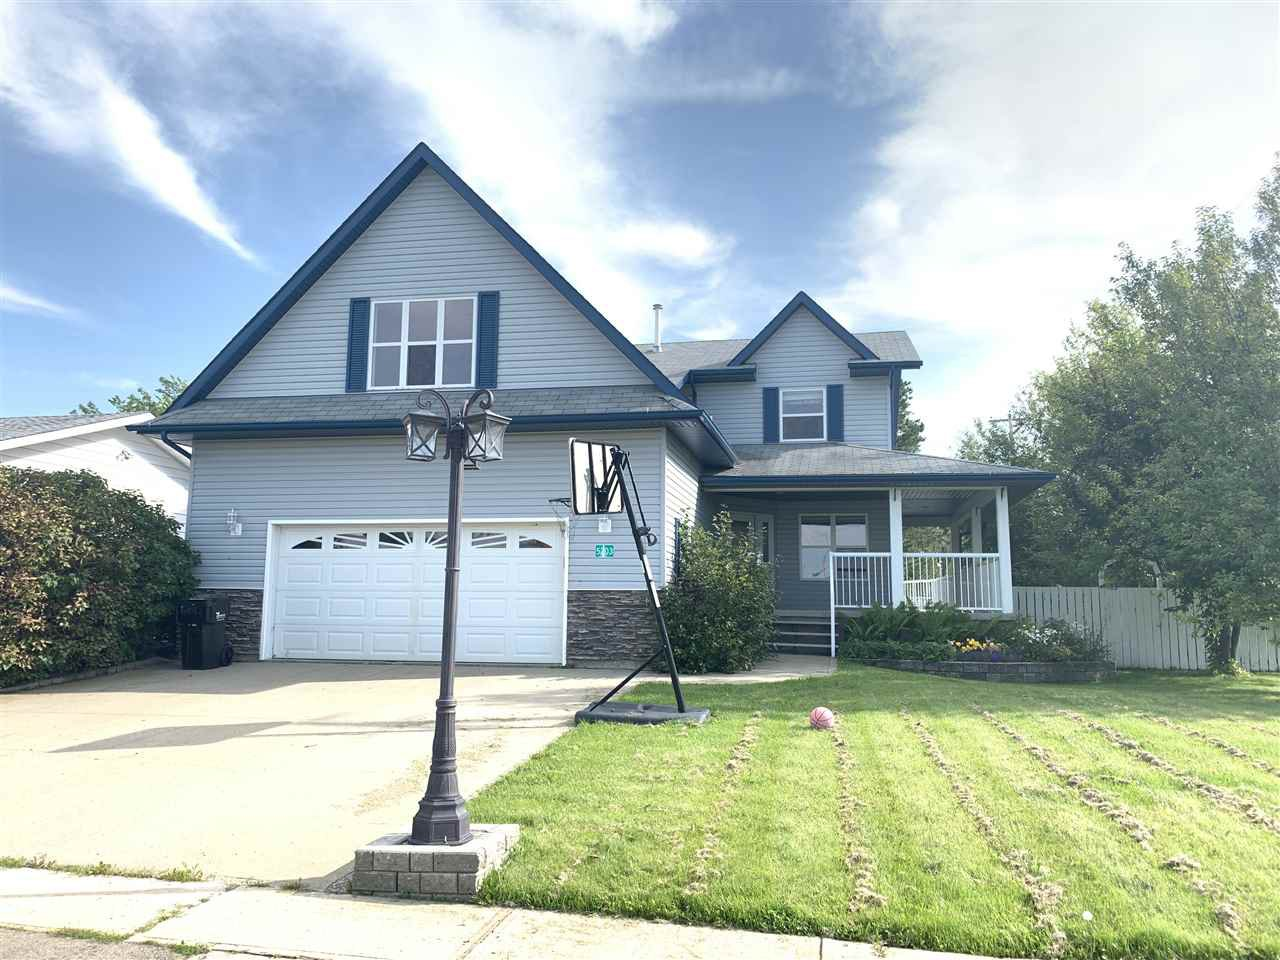 Main Photo: 5203 51 Avenue: Pickardville House for sale : MLS®# E4169304